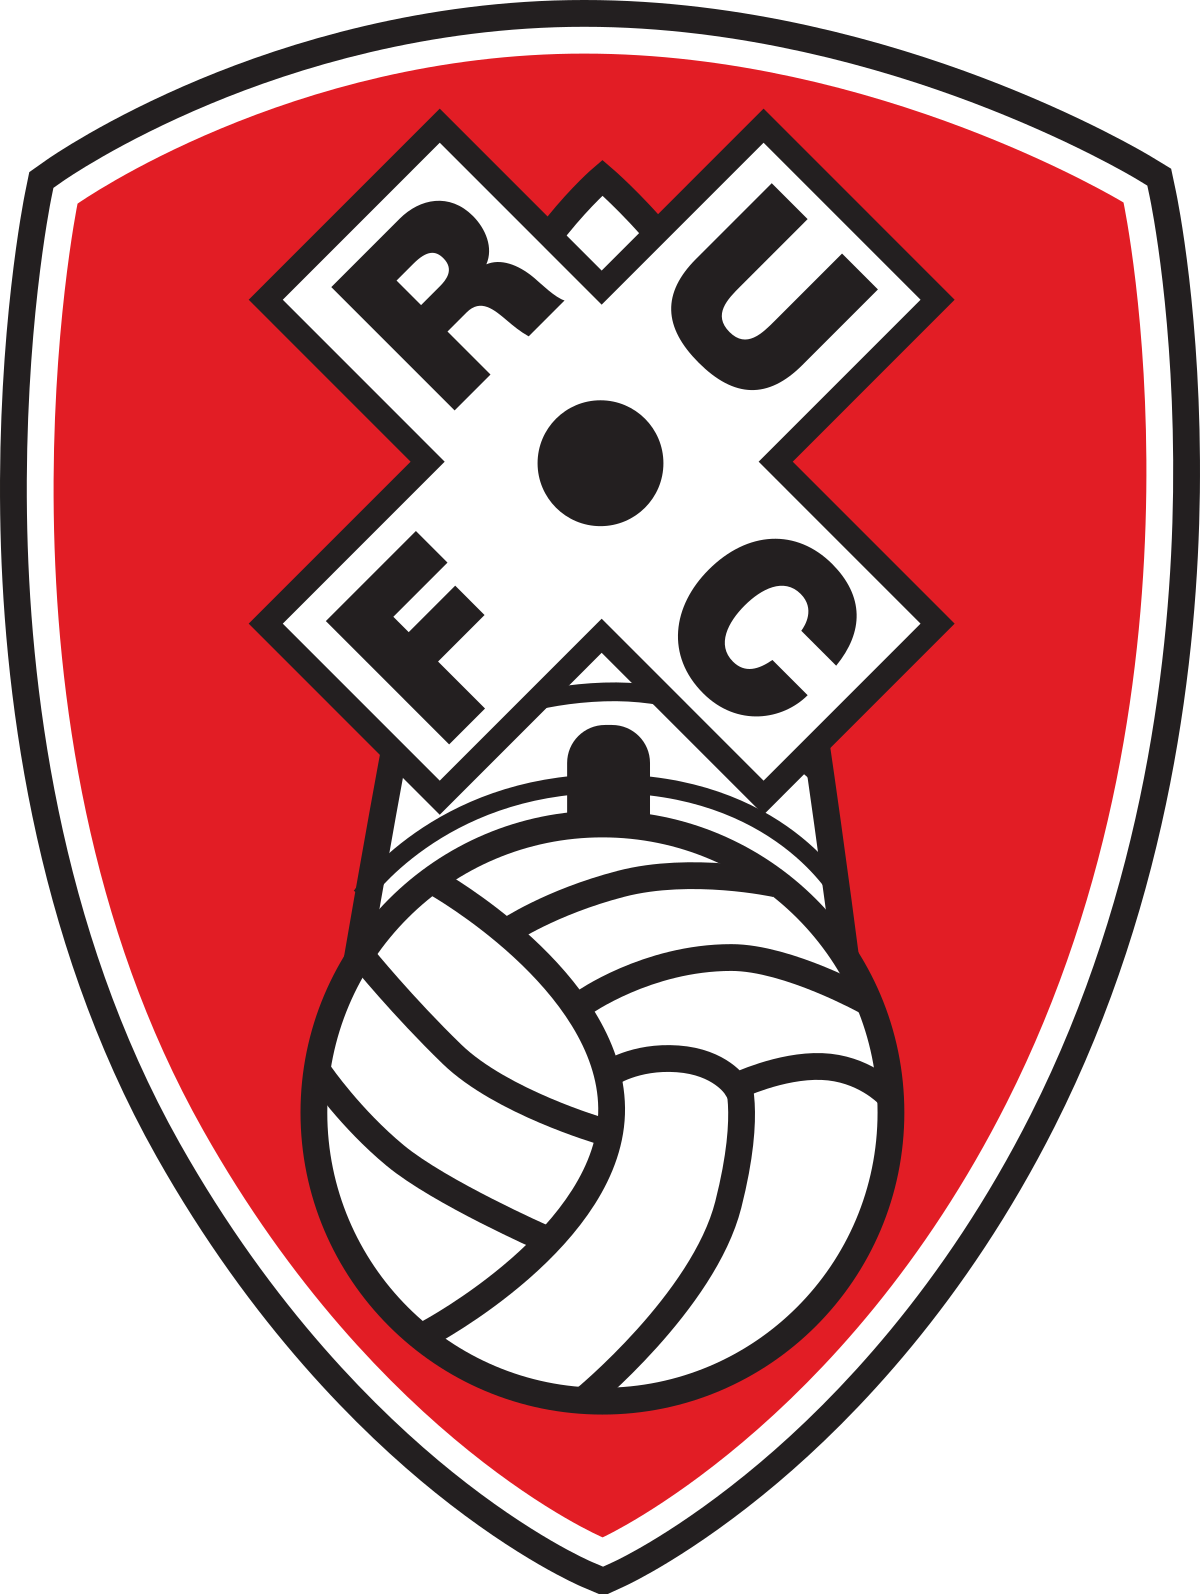 Rotherham United crest